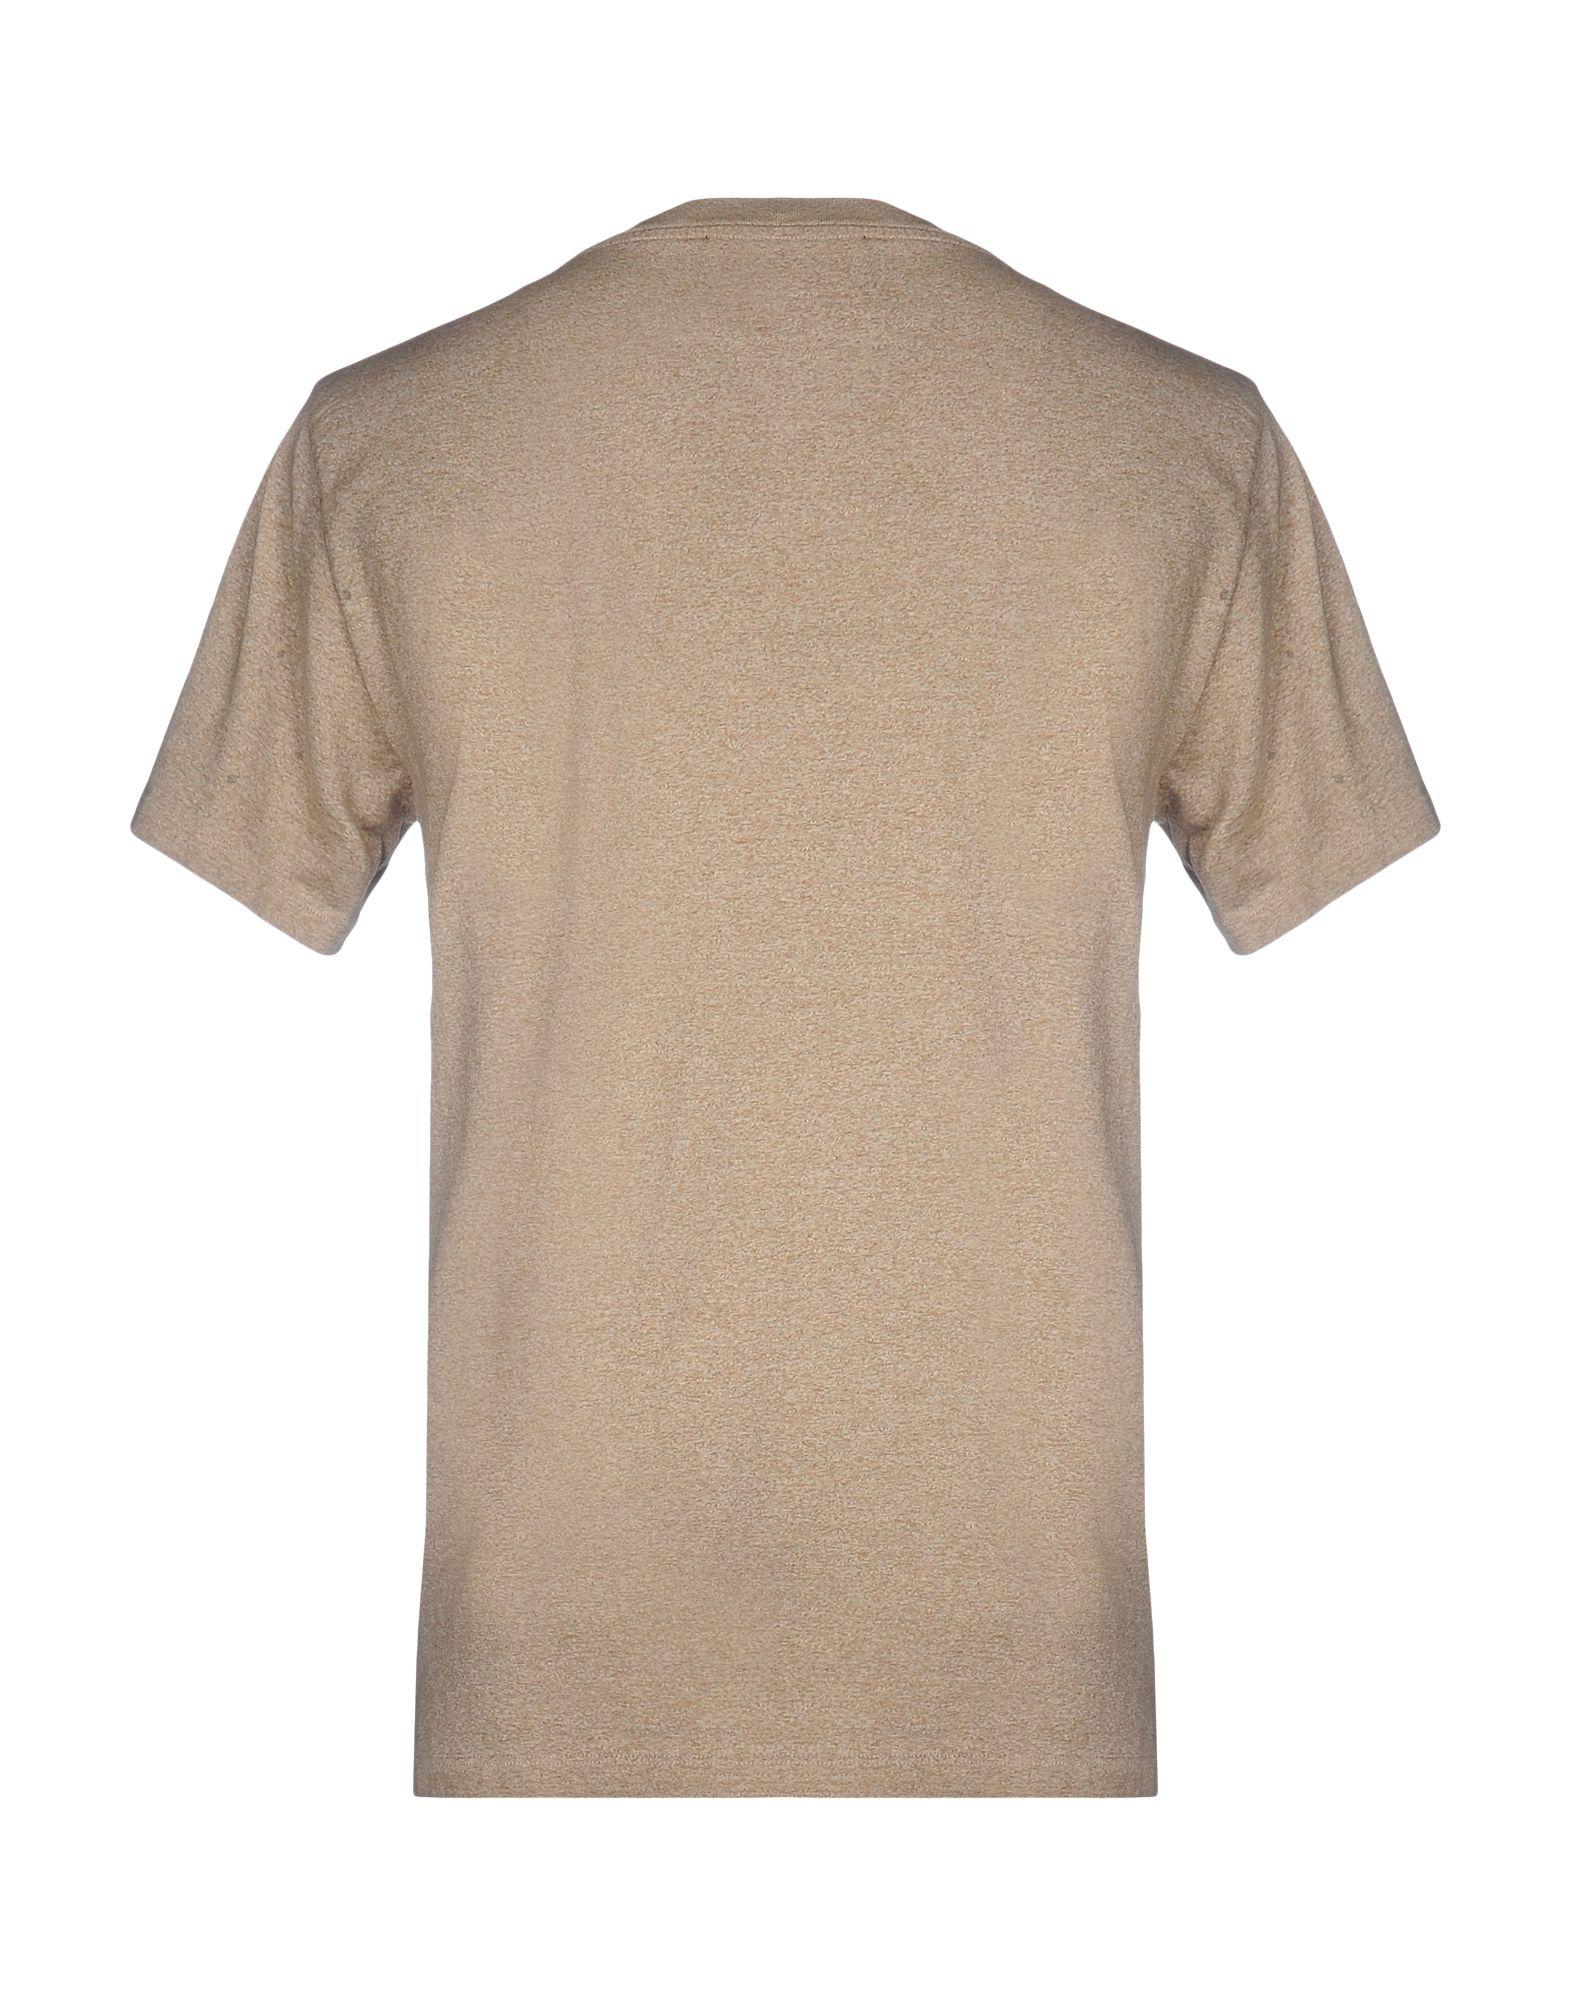 T-Shirt oroen Goose Deluxe Brand Uomo - 12012858DA 12012858DA - b0ddf2